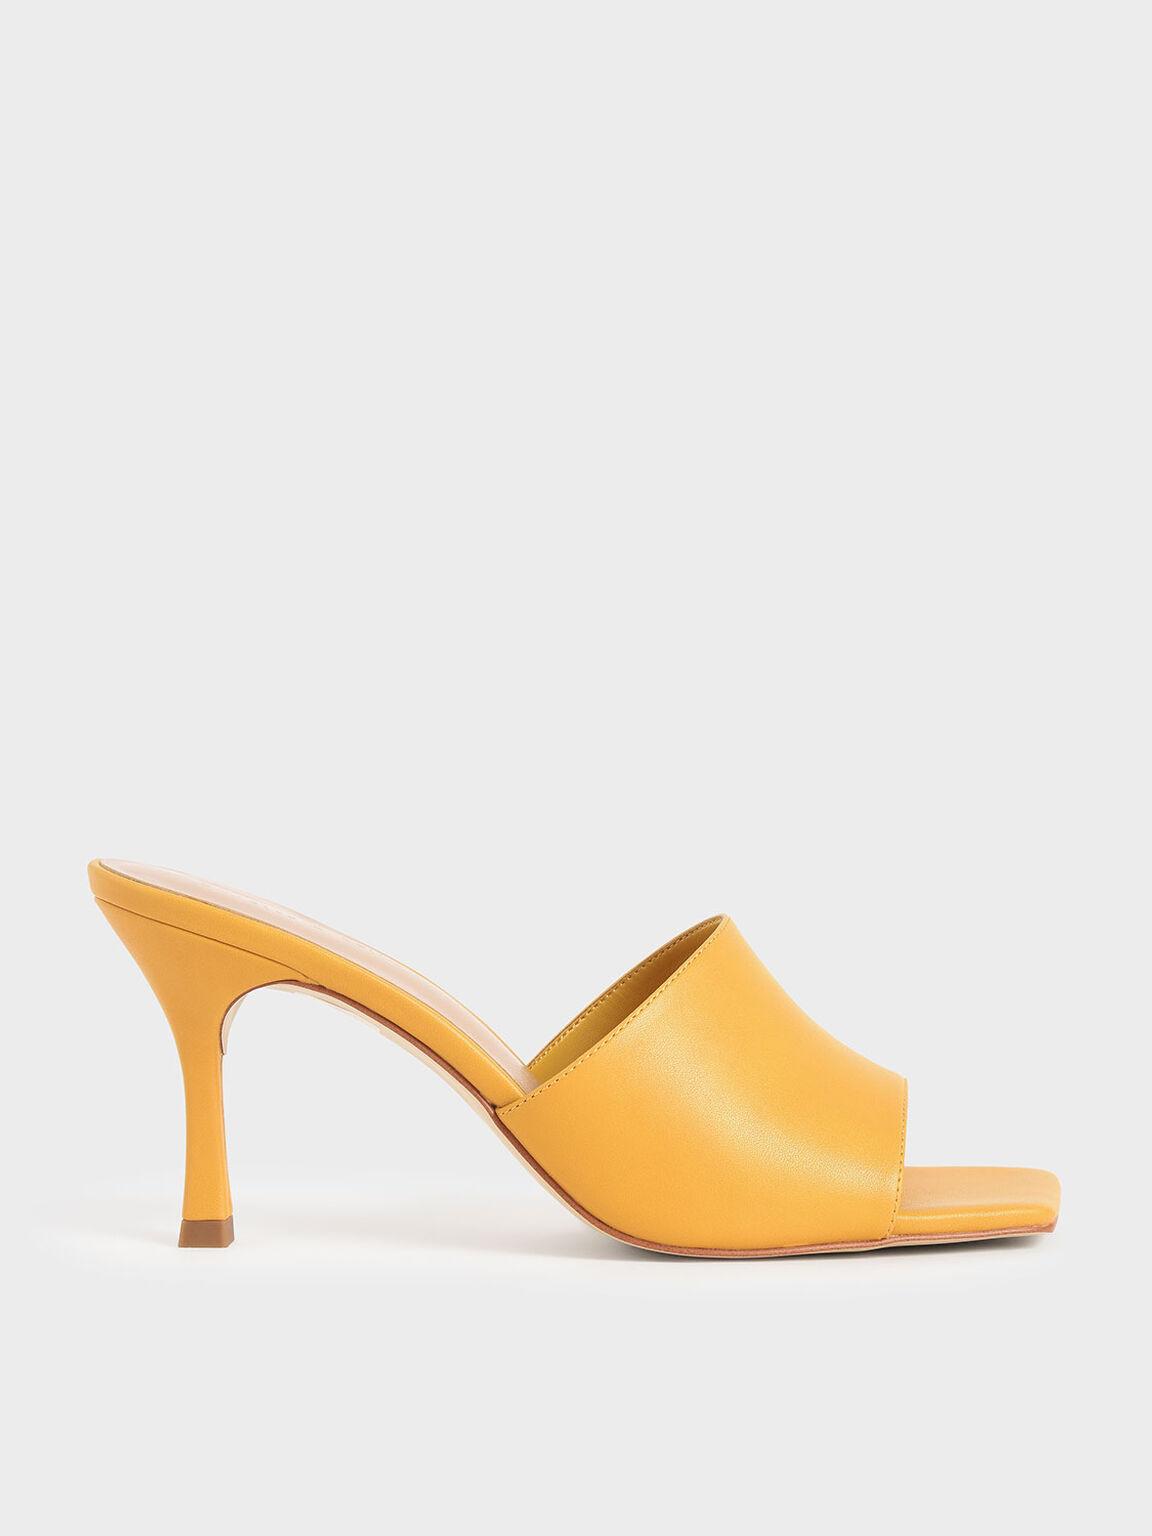 Square Toe Mules, Yellow, hi-res